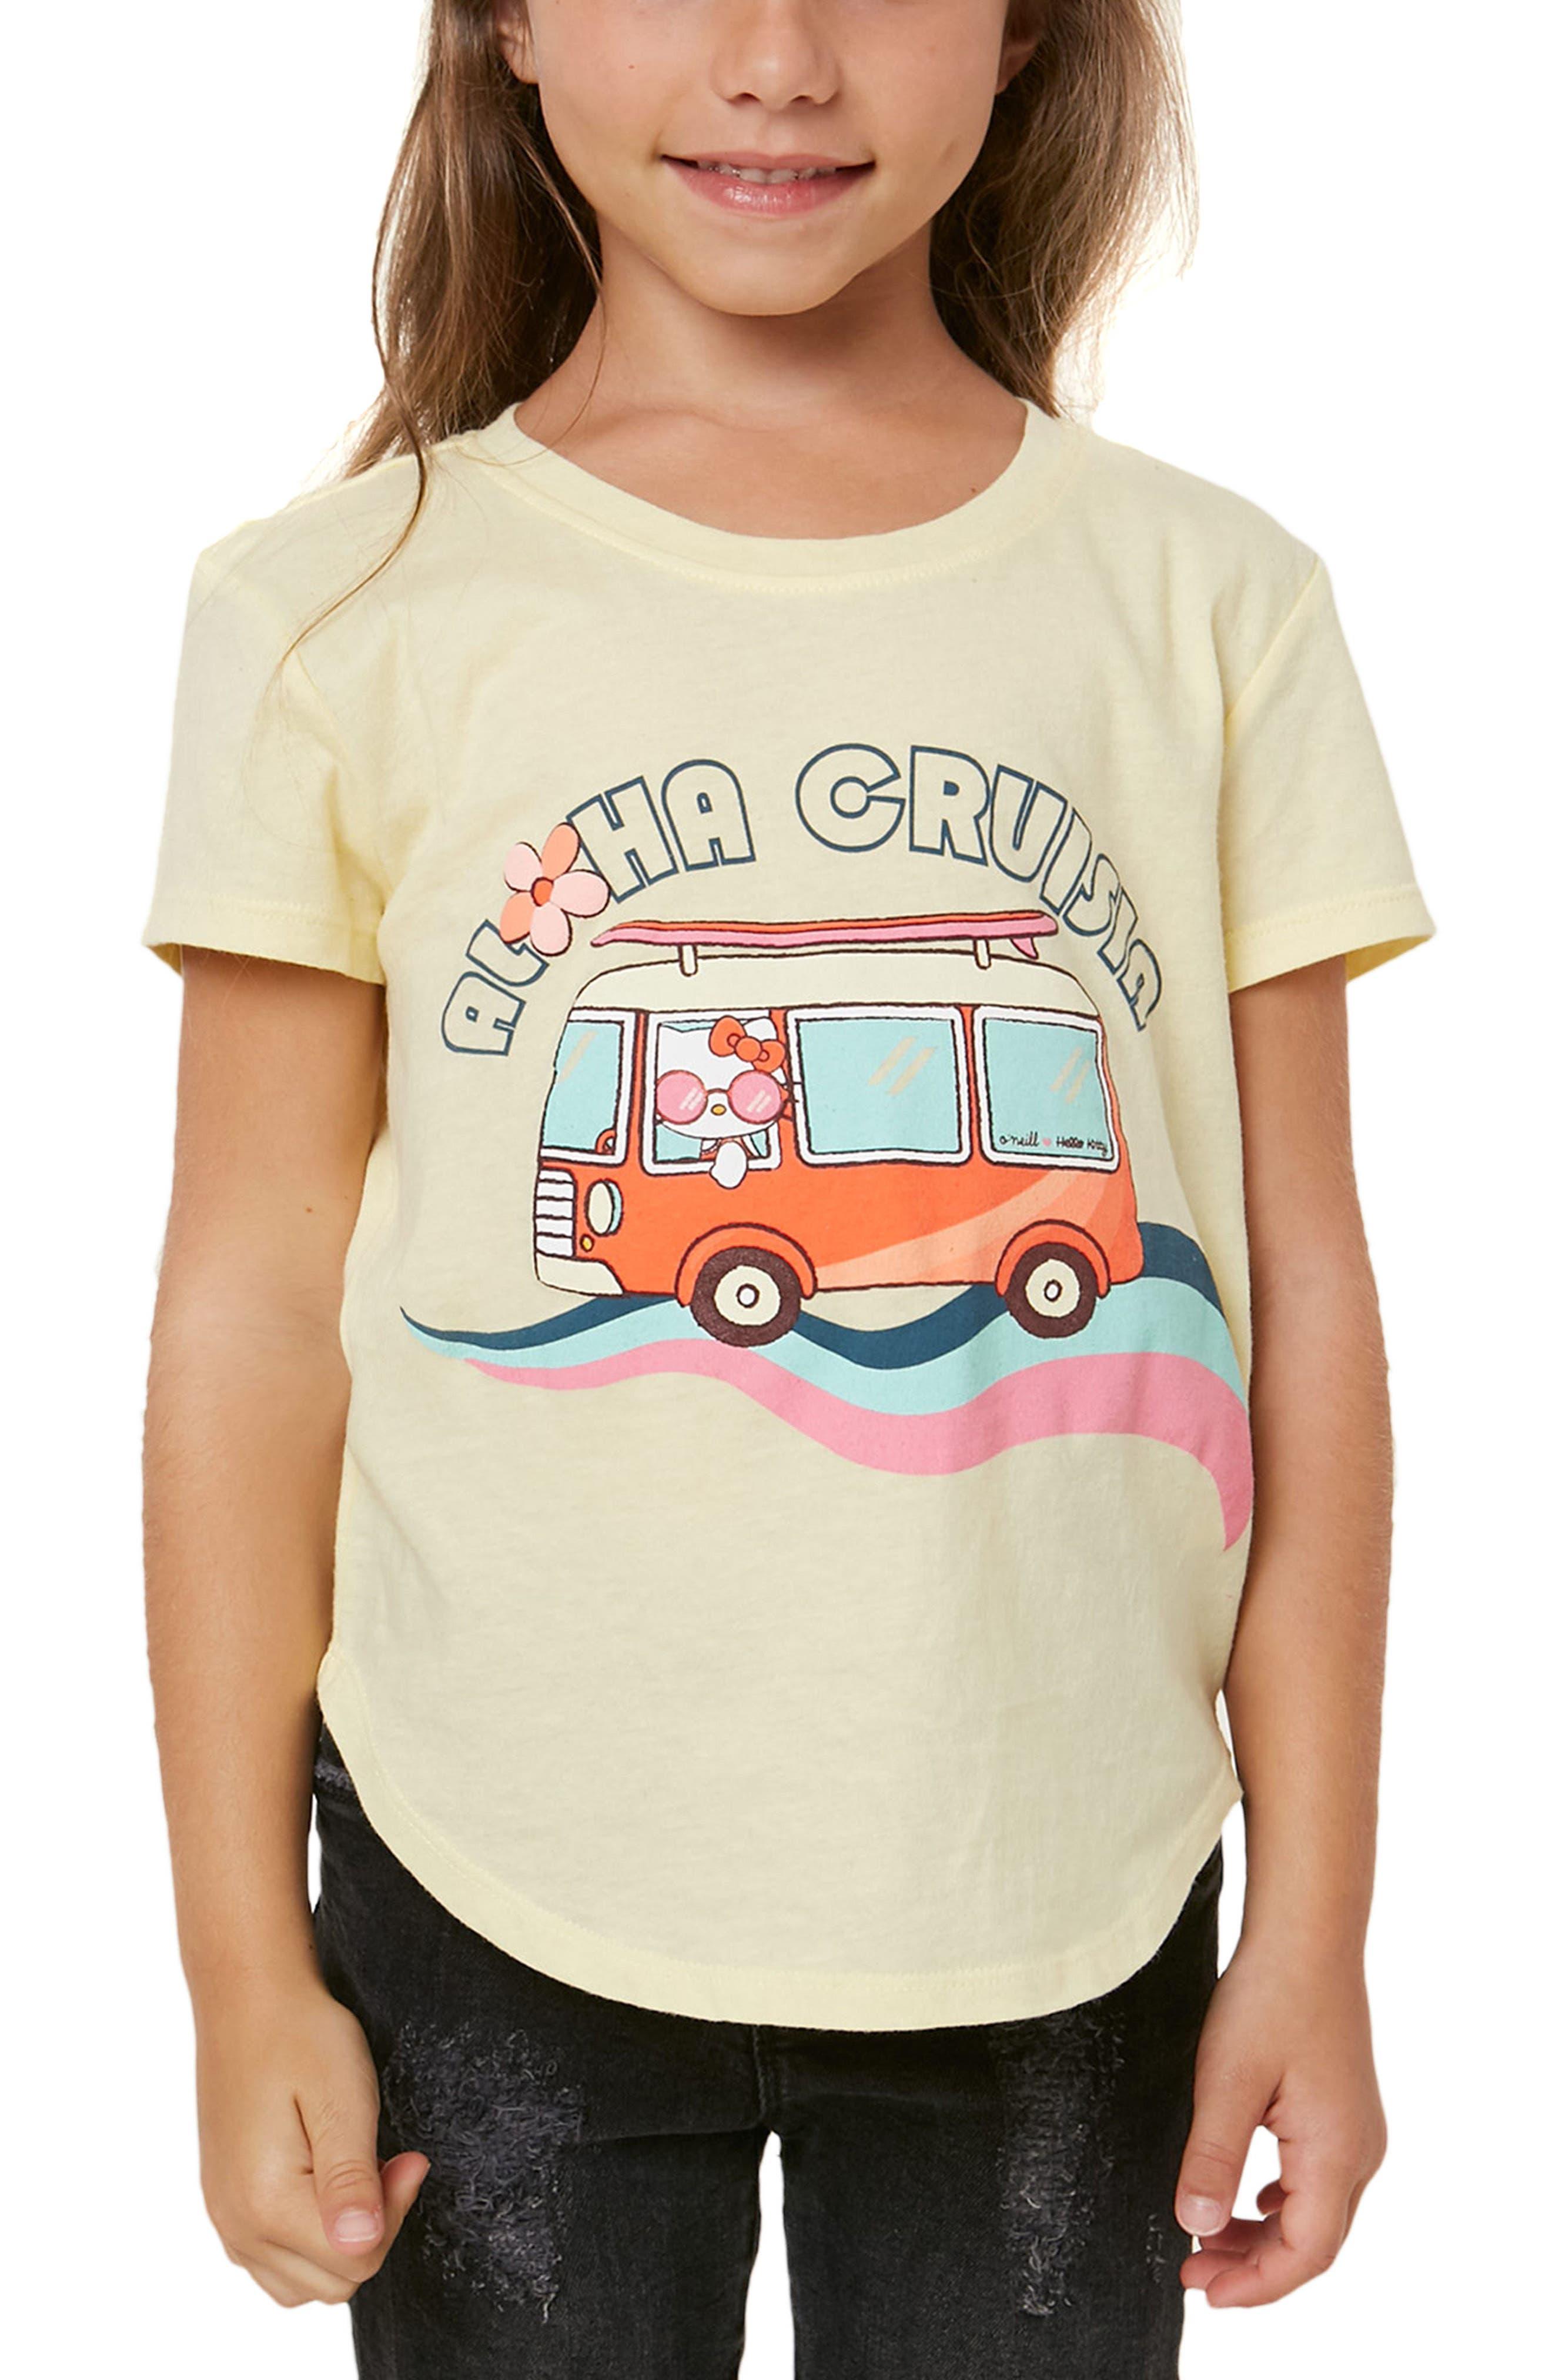 x Hello Kitty<sup>®</sup> Aloha Cruisin Graphic Tee,                         Main,                         color,